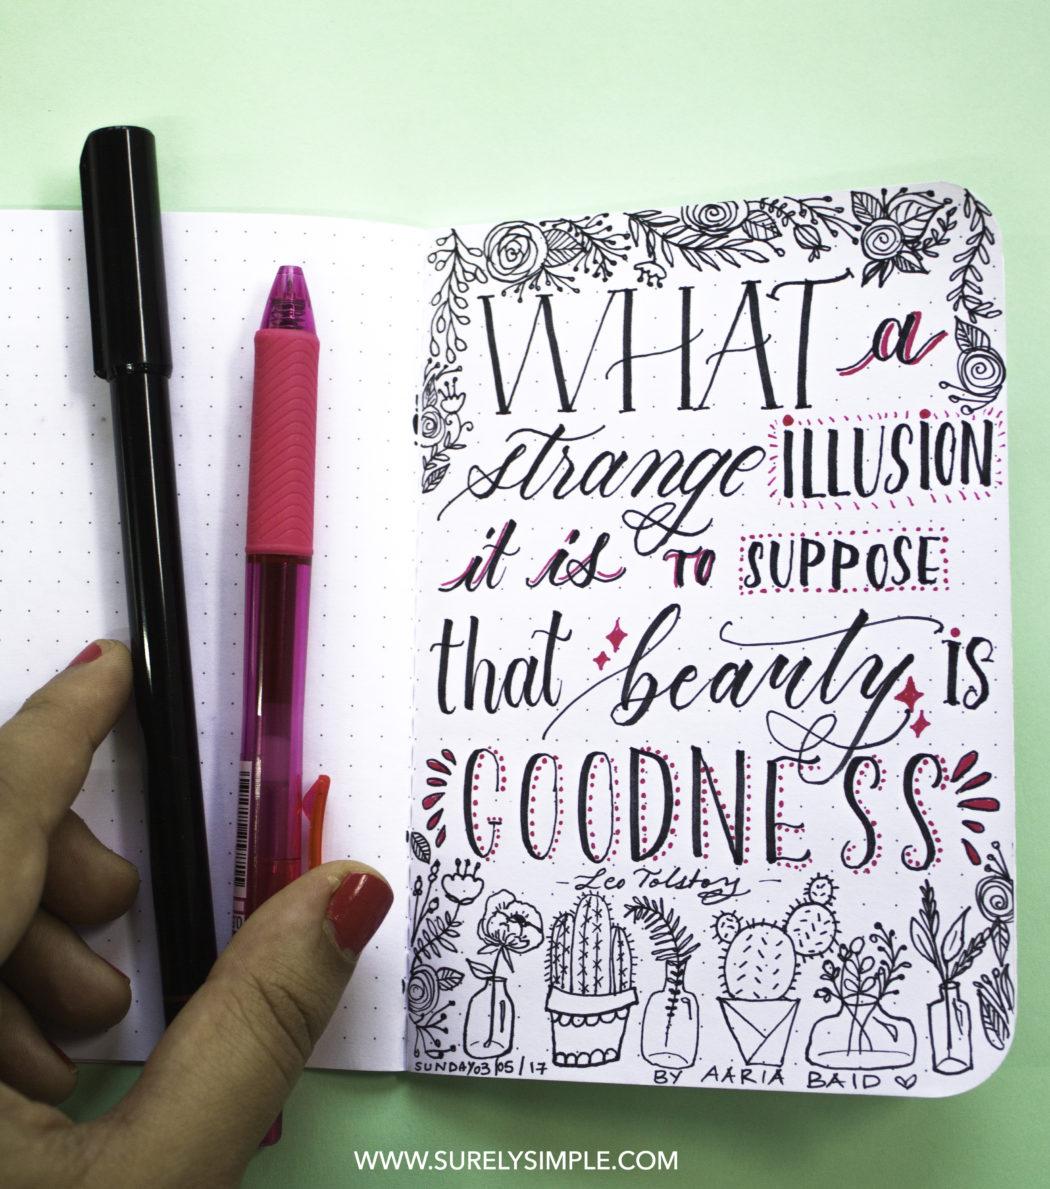 New Handlettering Quotes Project! daily quote series on surelysimple.com instagram.com/surelysimpleblog